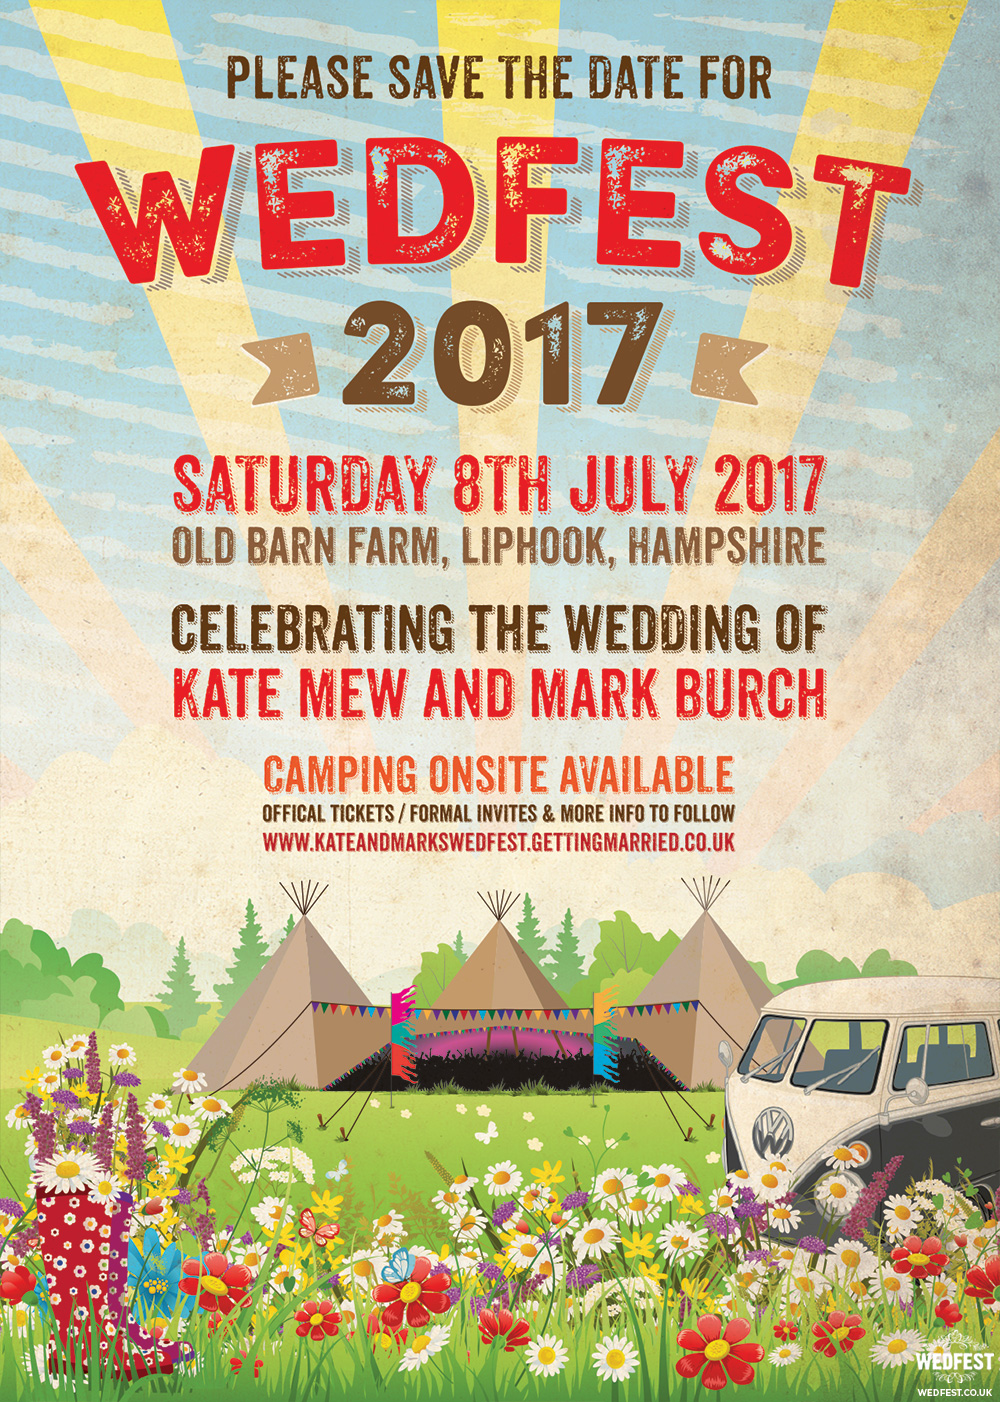 old barn farm wedfest festival wedding save the date